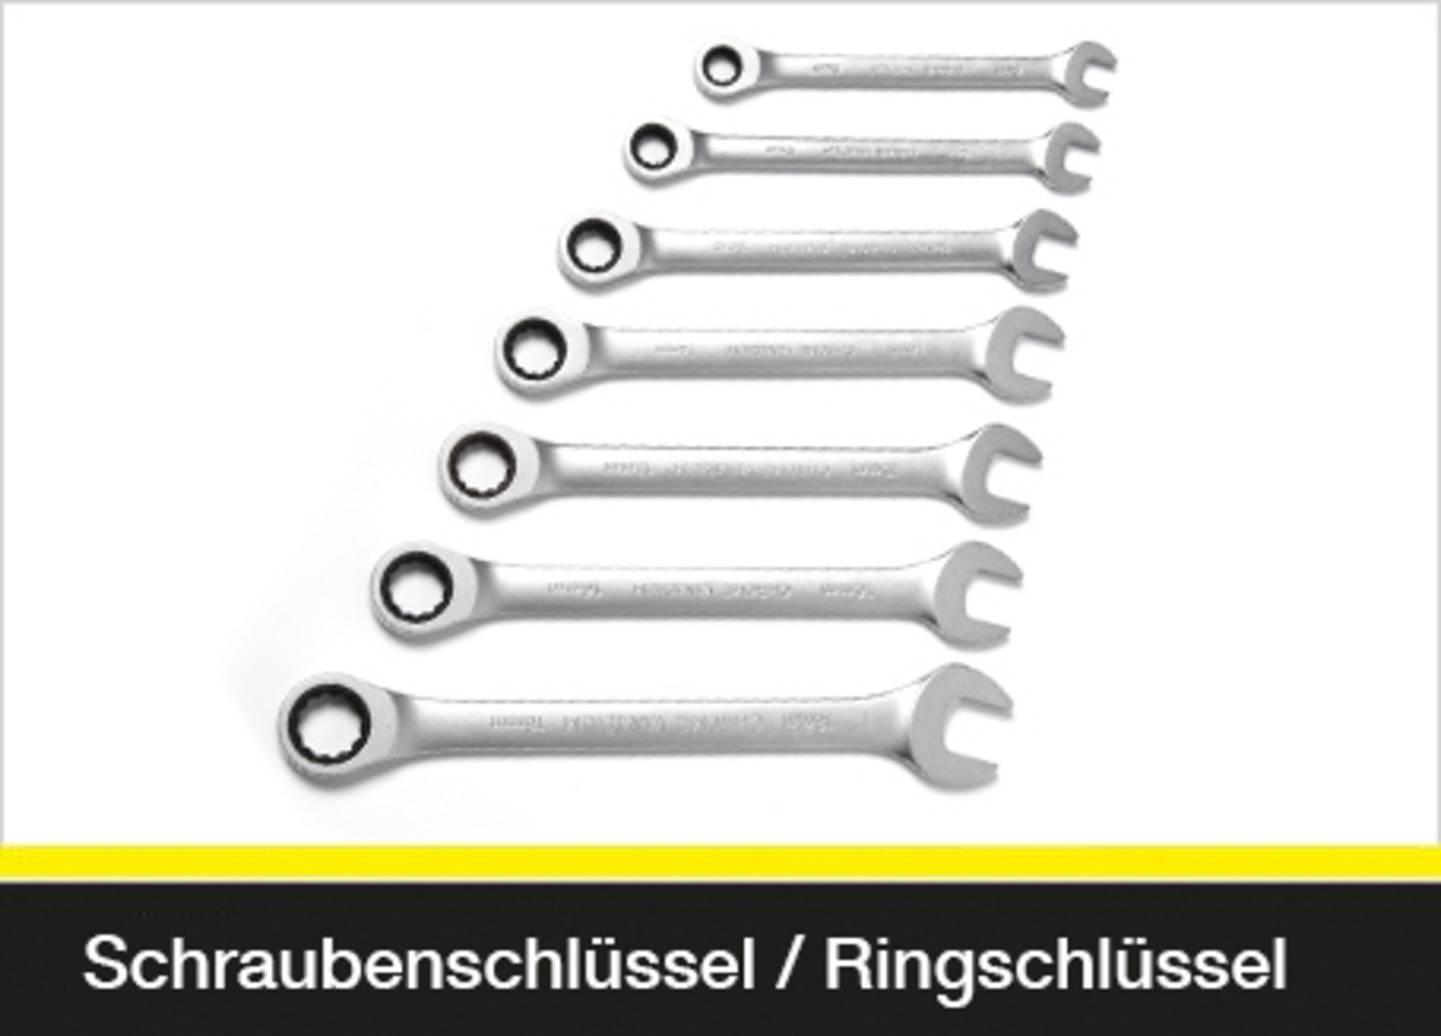 Schraubenschlüssel / Ringschlüssel